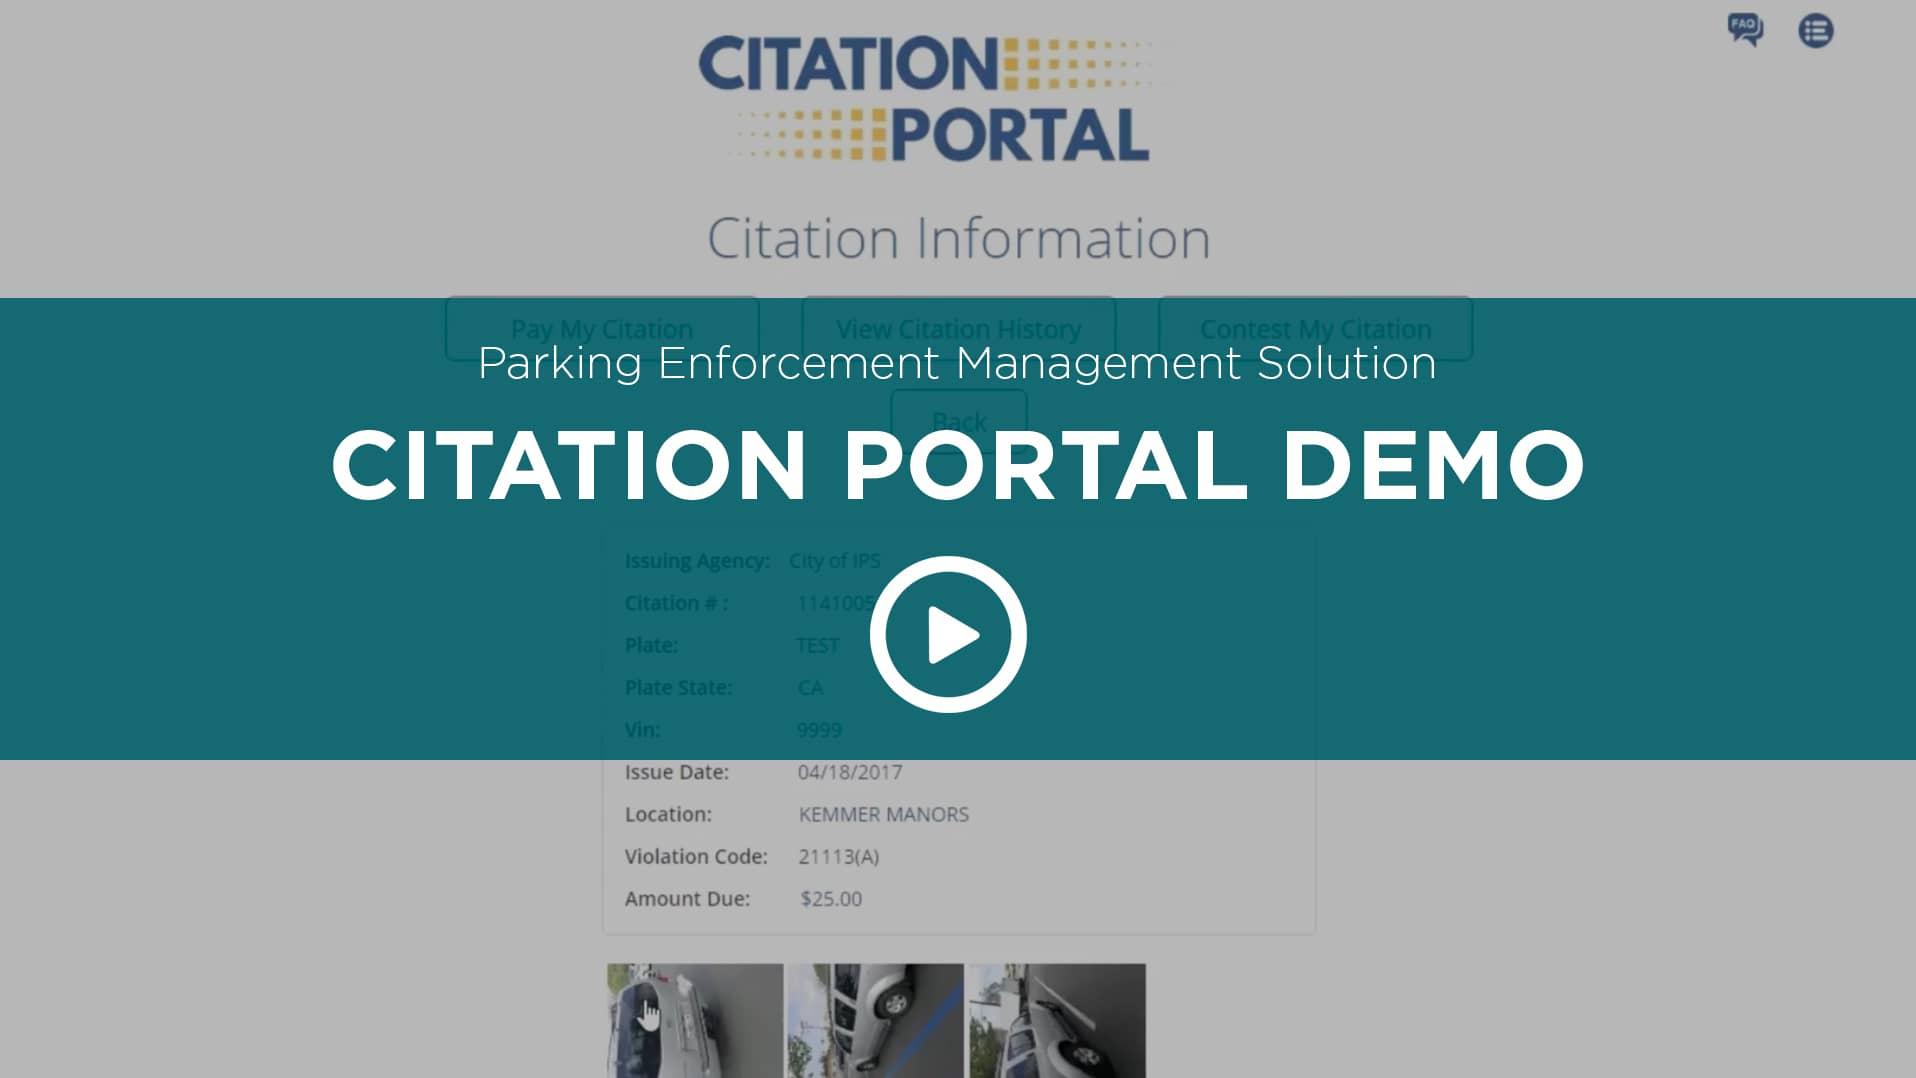 Citation Portal Demo